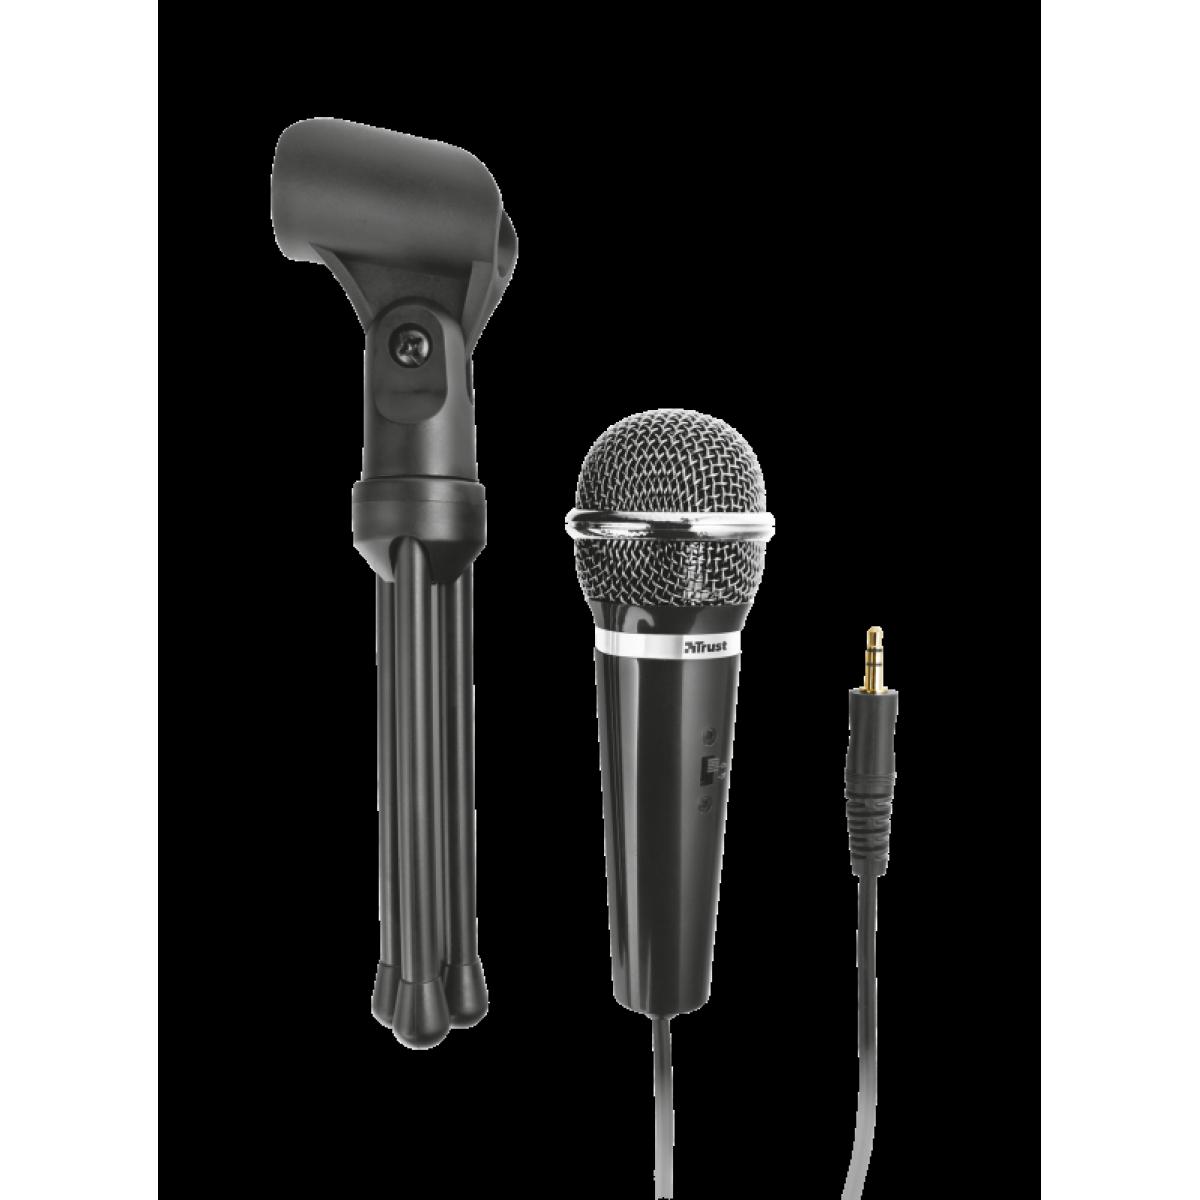 Microfone Trust Starzz All Round, PC ou Laptop, T21671